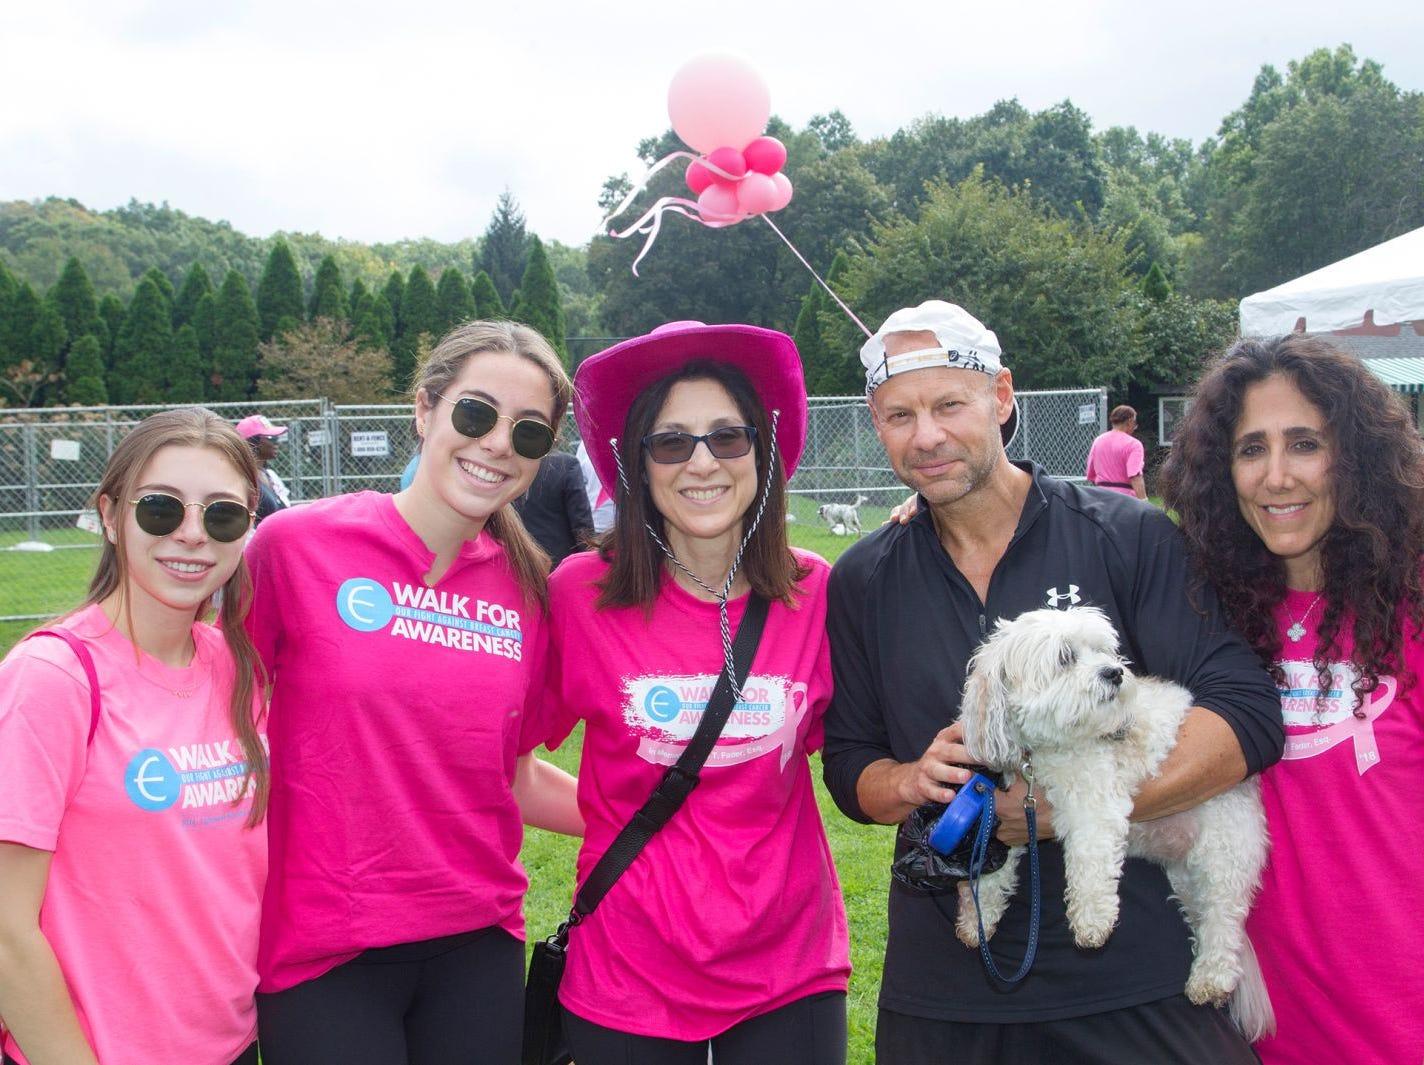 Danielle, Lauren, Shari, Mark, Nikki, Carolyn. Englewood Health Foundation hosted its 2018 Walk for Awareness and Susan Lucianna Memorial Dog Walk dedicated in memory of Walk for Awareness co-founder Paul Fader, Esq. 10/07/2018